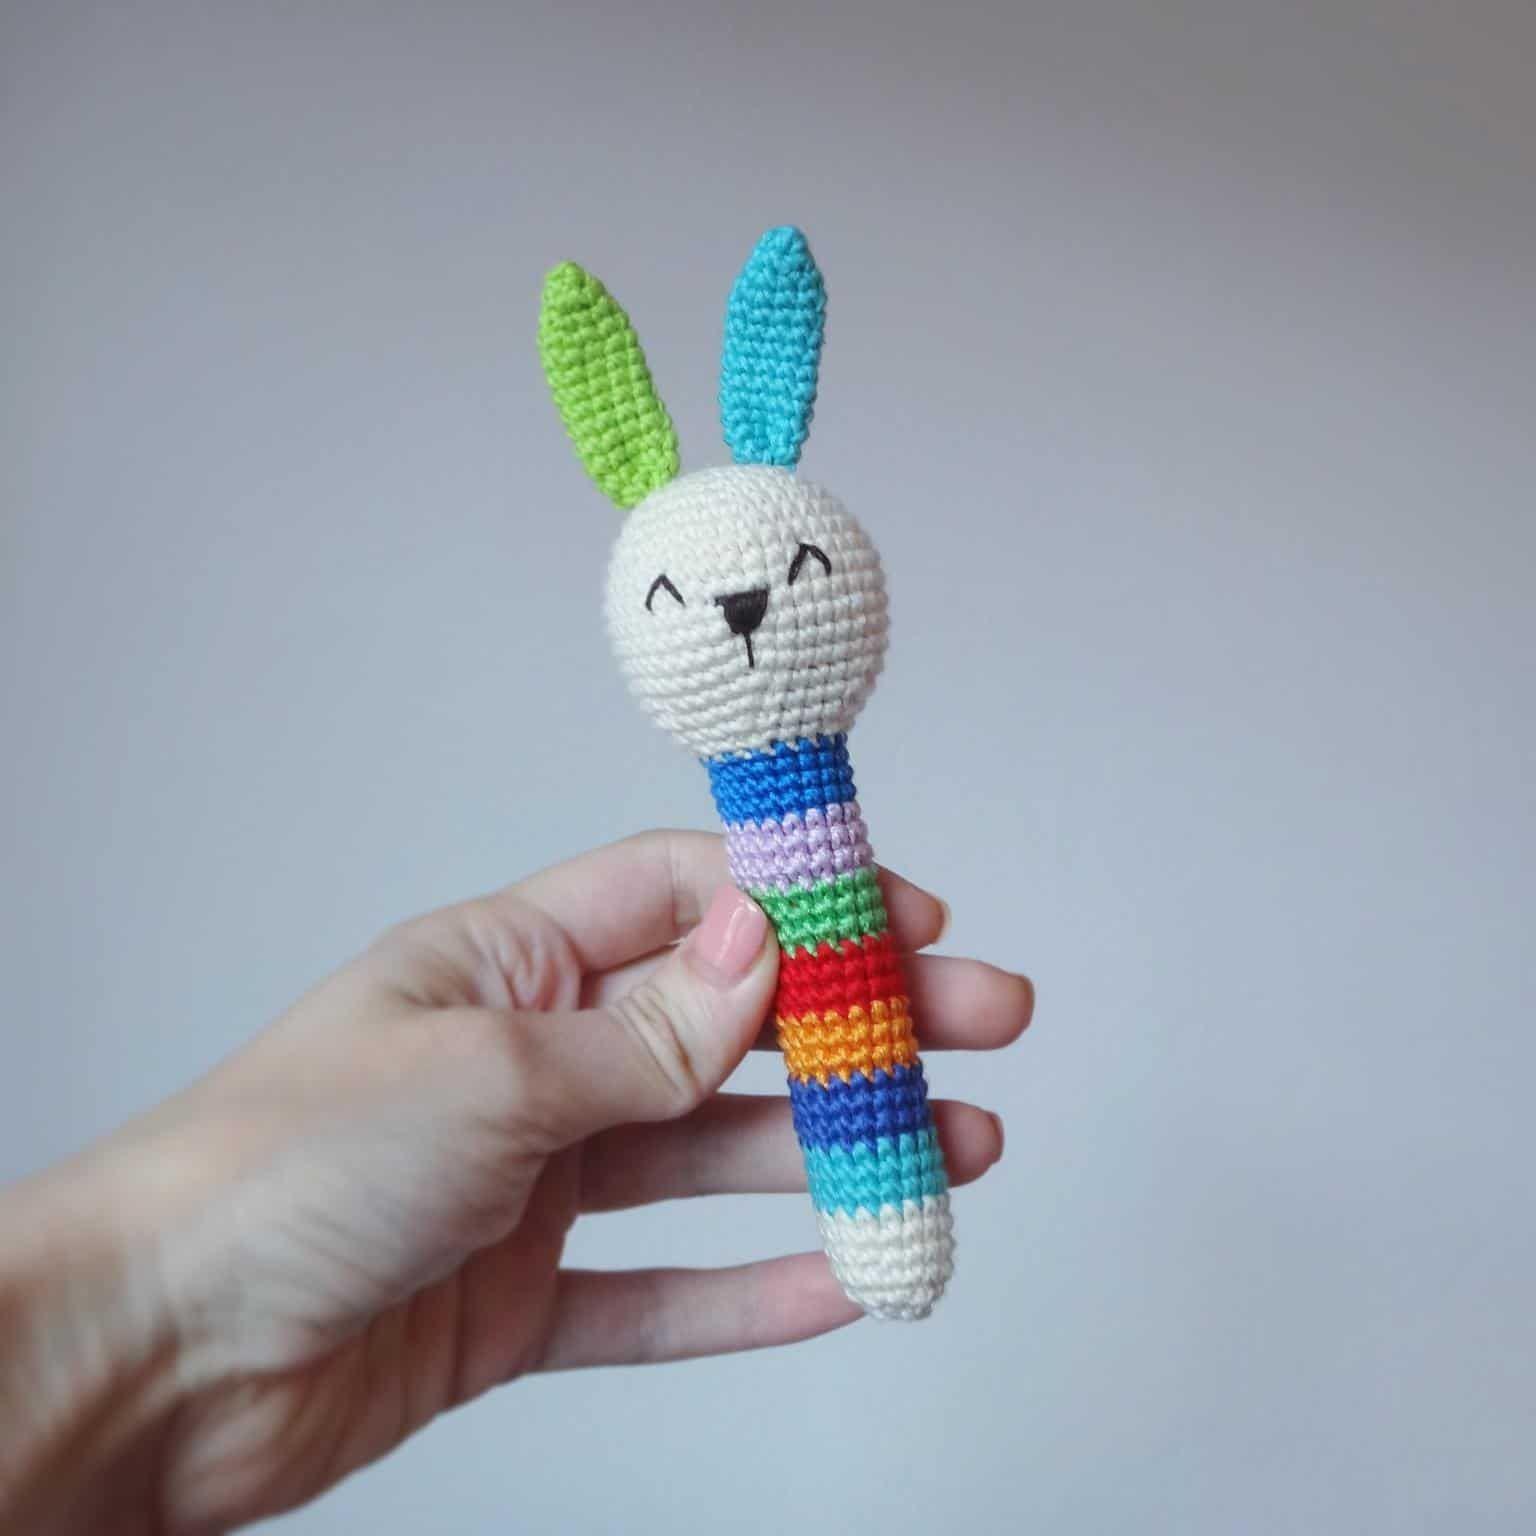 Сrochet Tier Rasseln frei Kaninchen Muster | Amigurumi | Pinterest ...